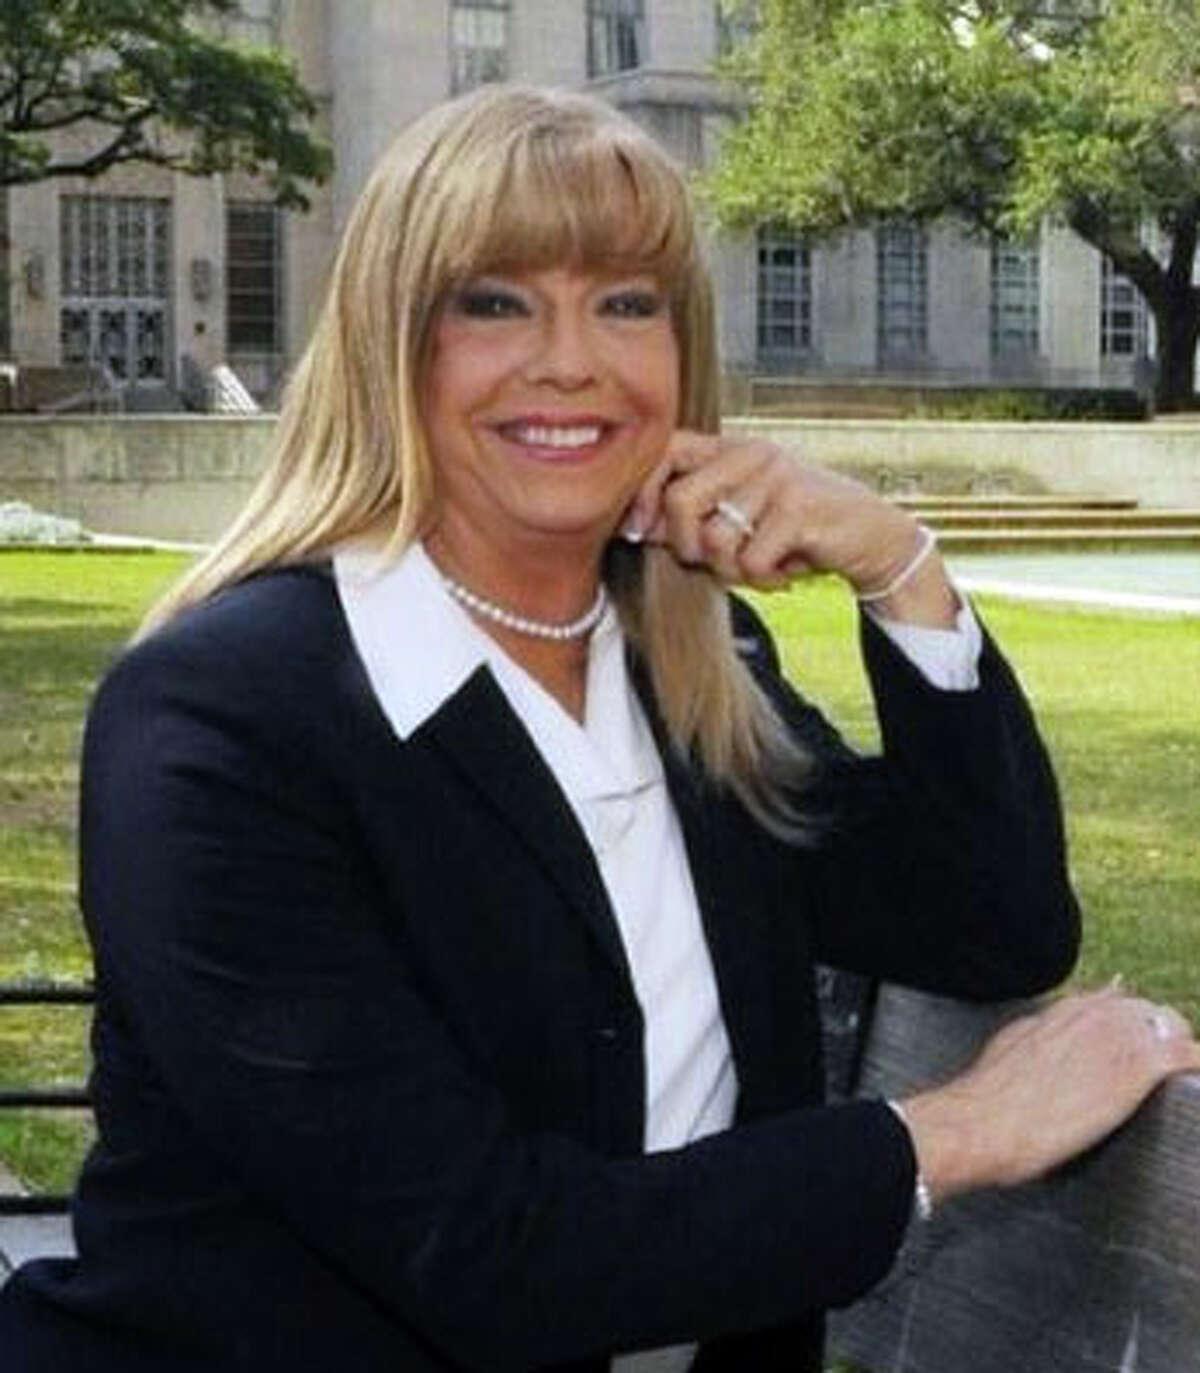 Democrat Jenifer Rene Pool is challenging longtime Harris County Precinct 3 Commissioner Steve Radack in November.